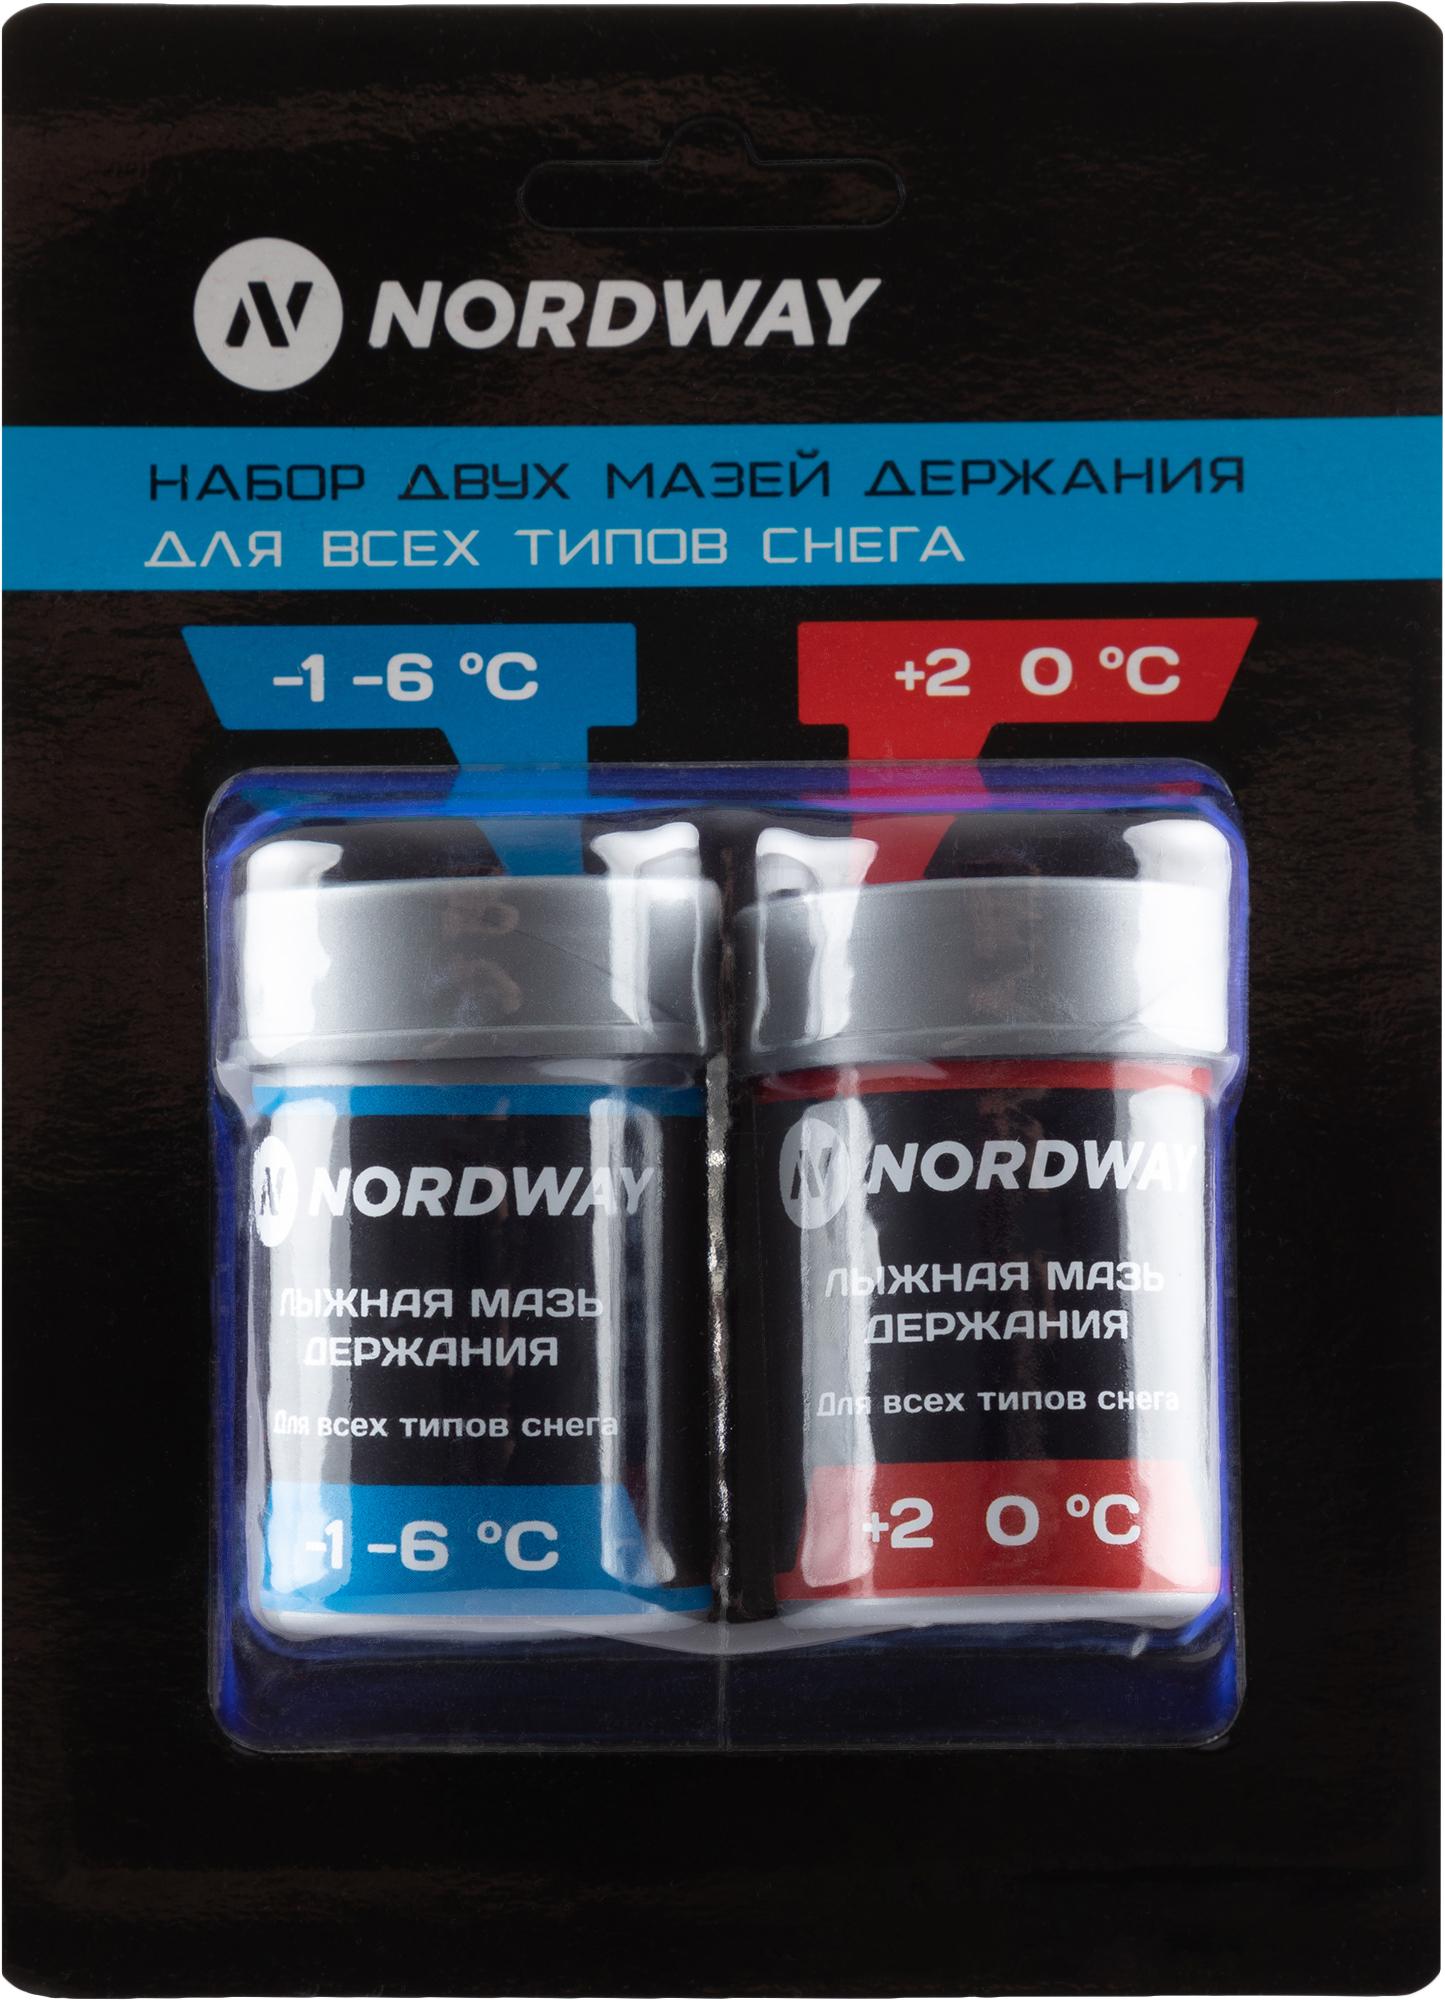 Nordway Набор лыжный: мазь для лыж Nordway, 2 шт.